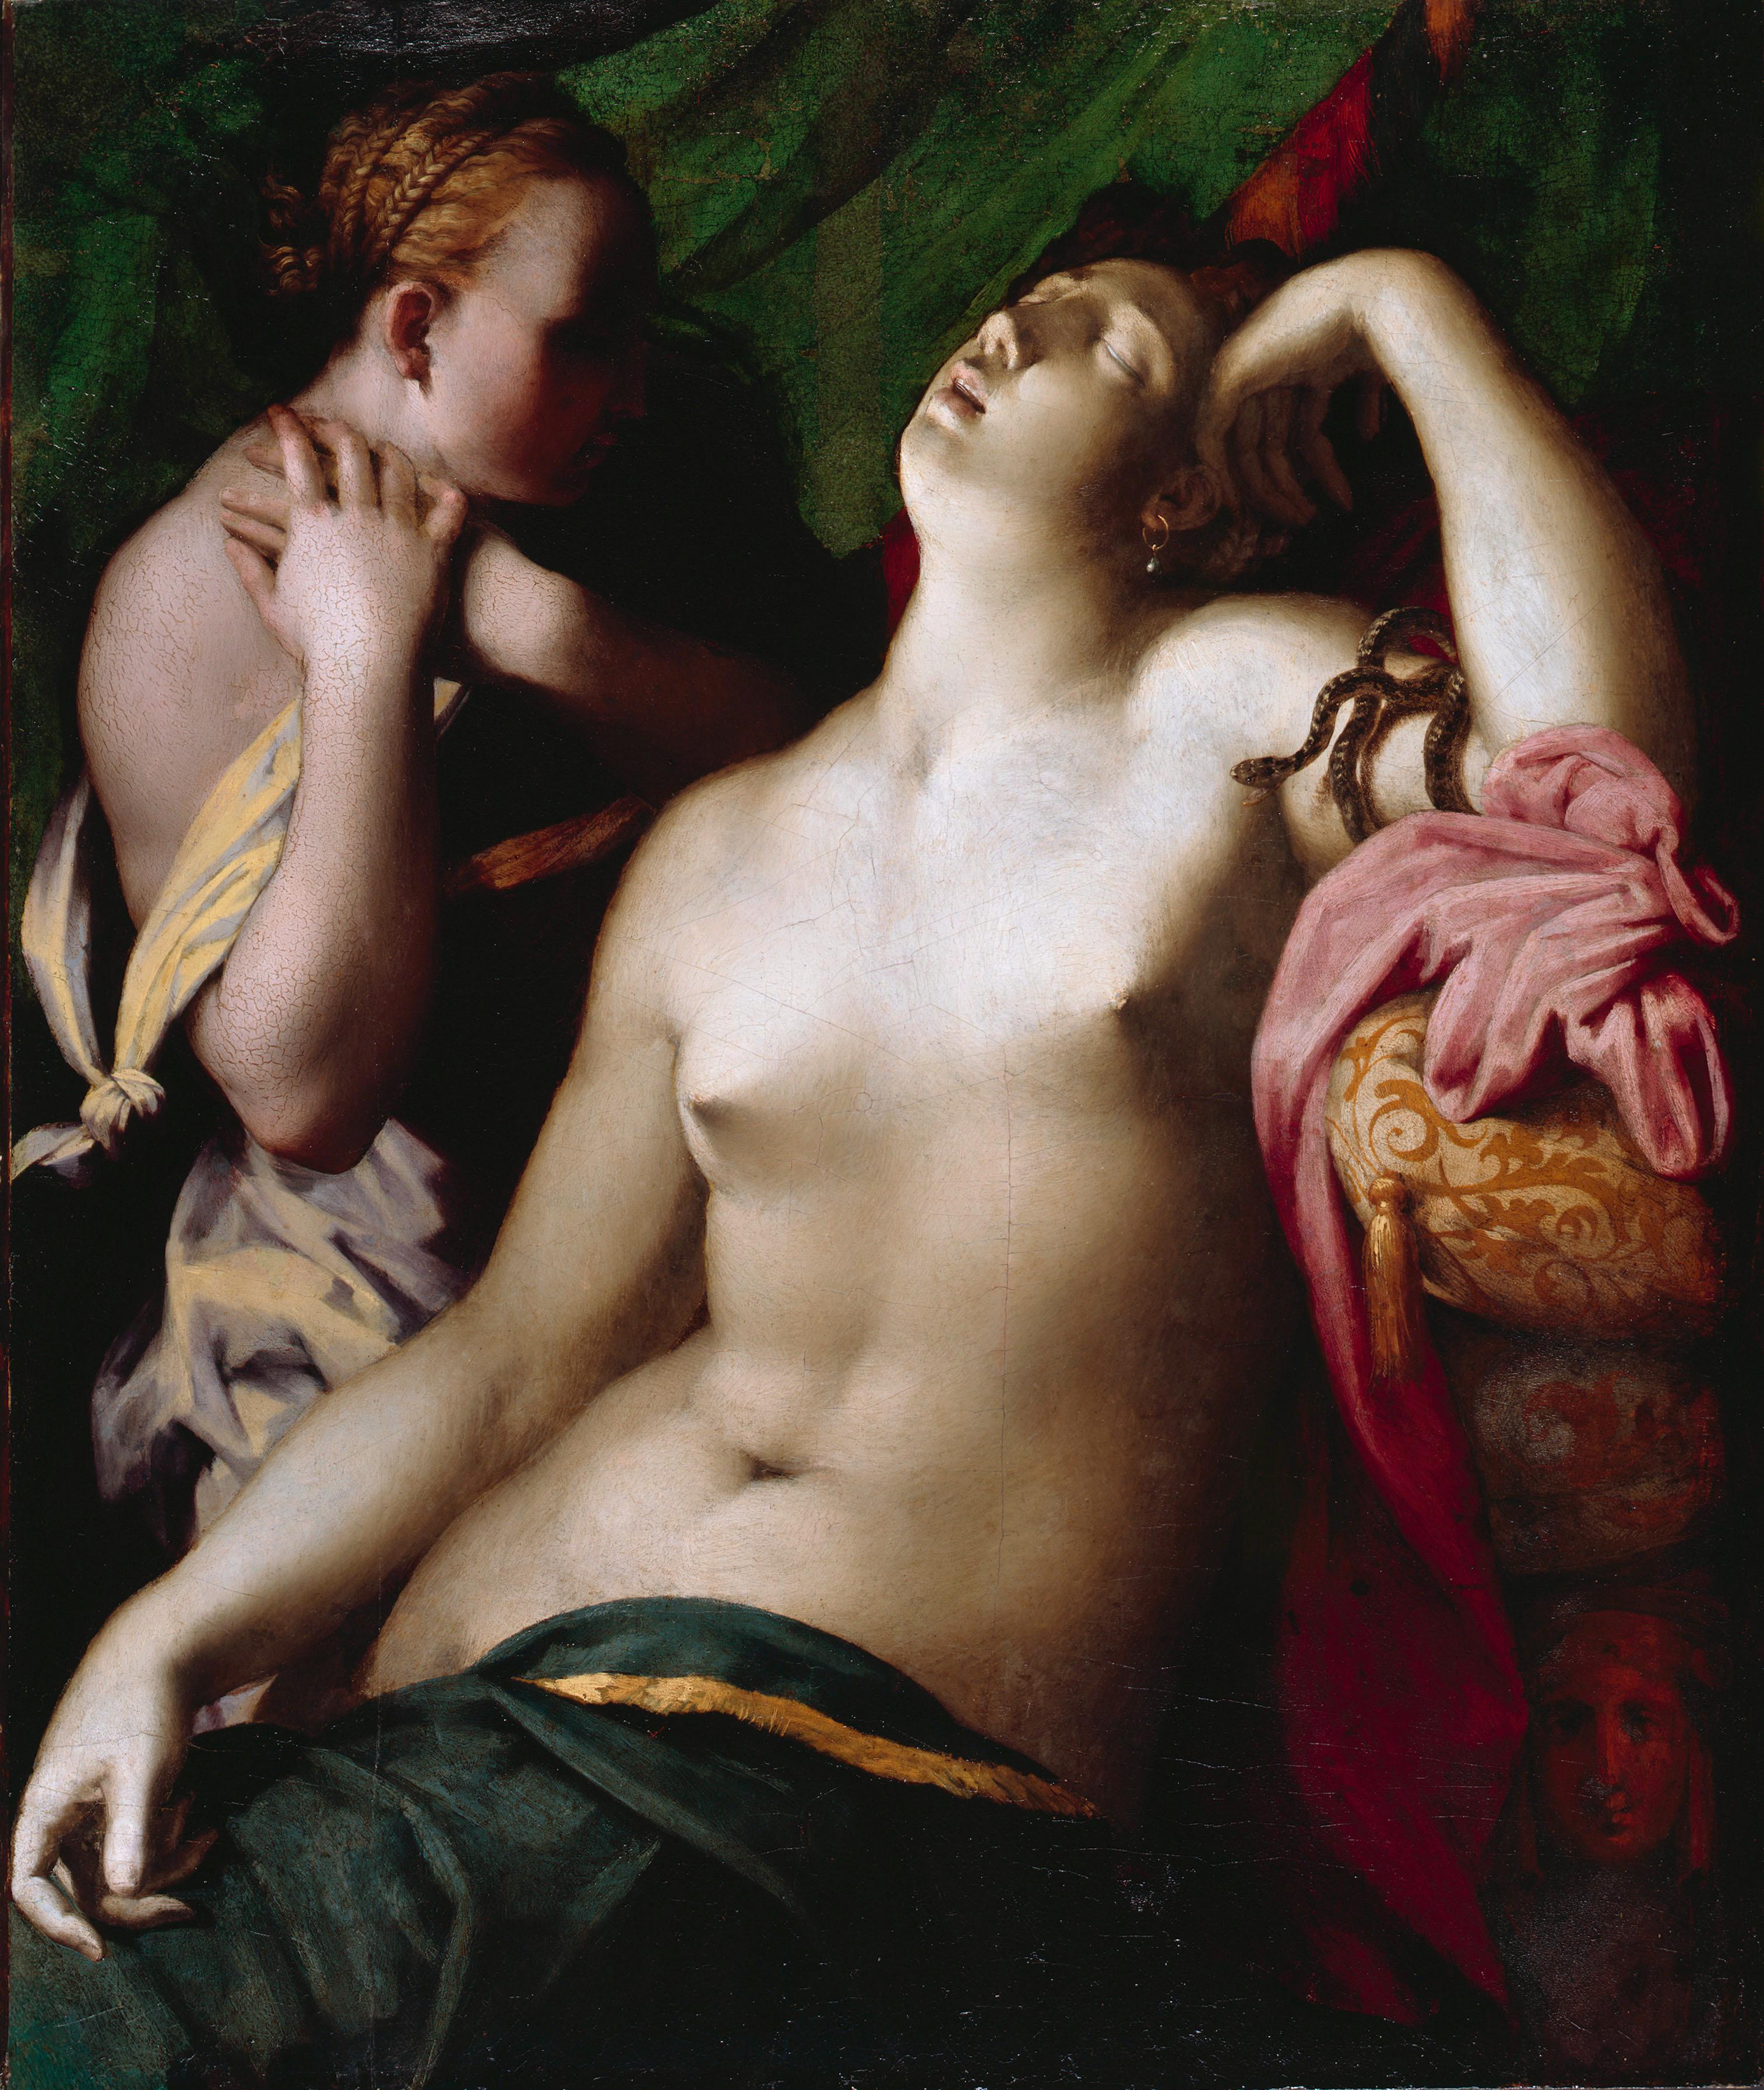 cleopatra origin